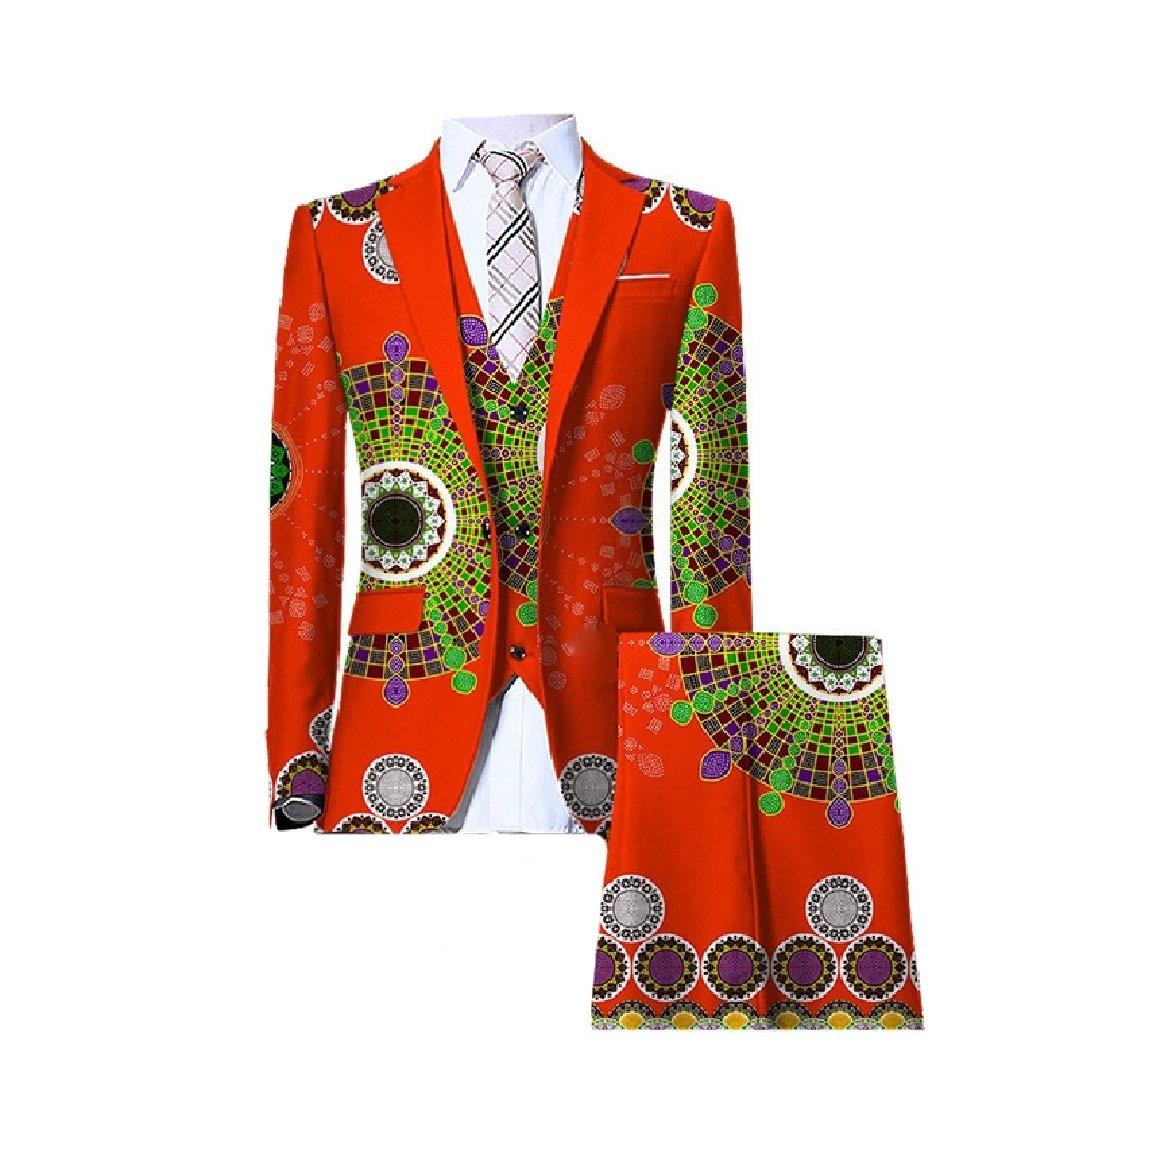 Abetteric Men African Wax Fabric Dashiki 3 Piece Suit Blazer Vest Pants Set Orange 4XL